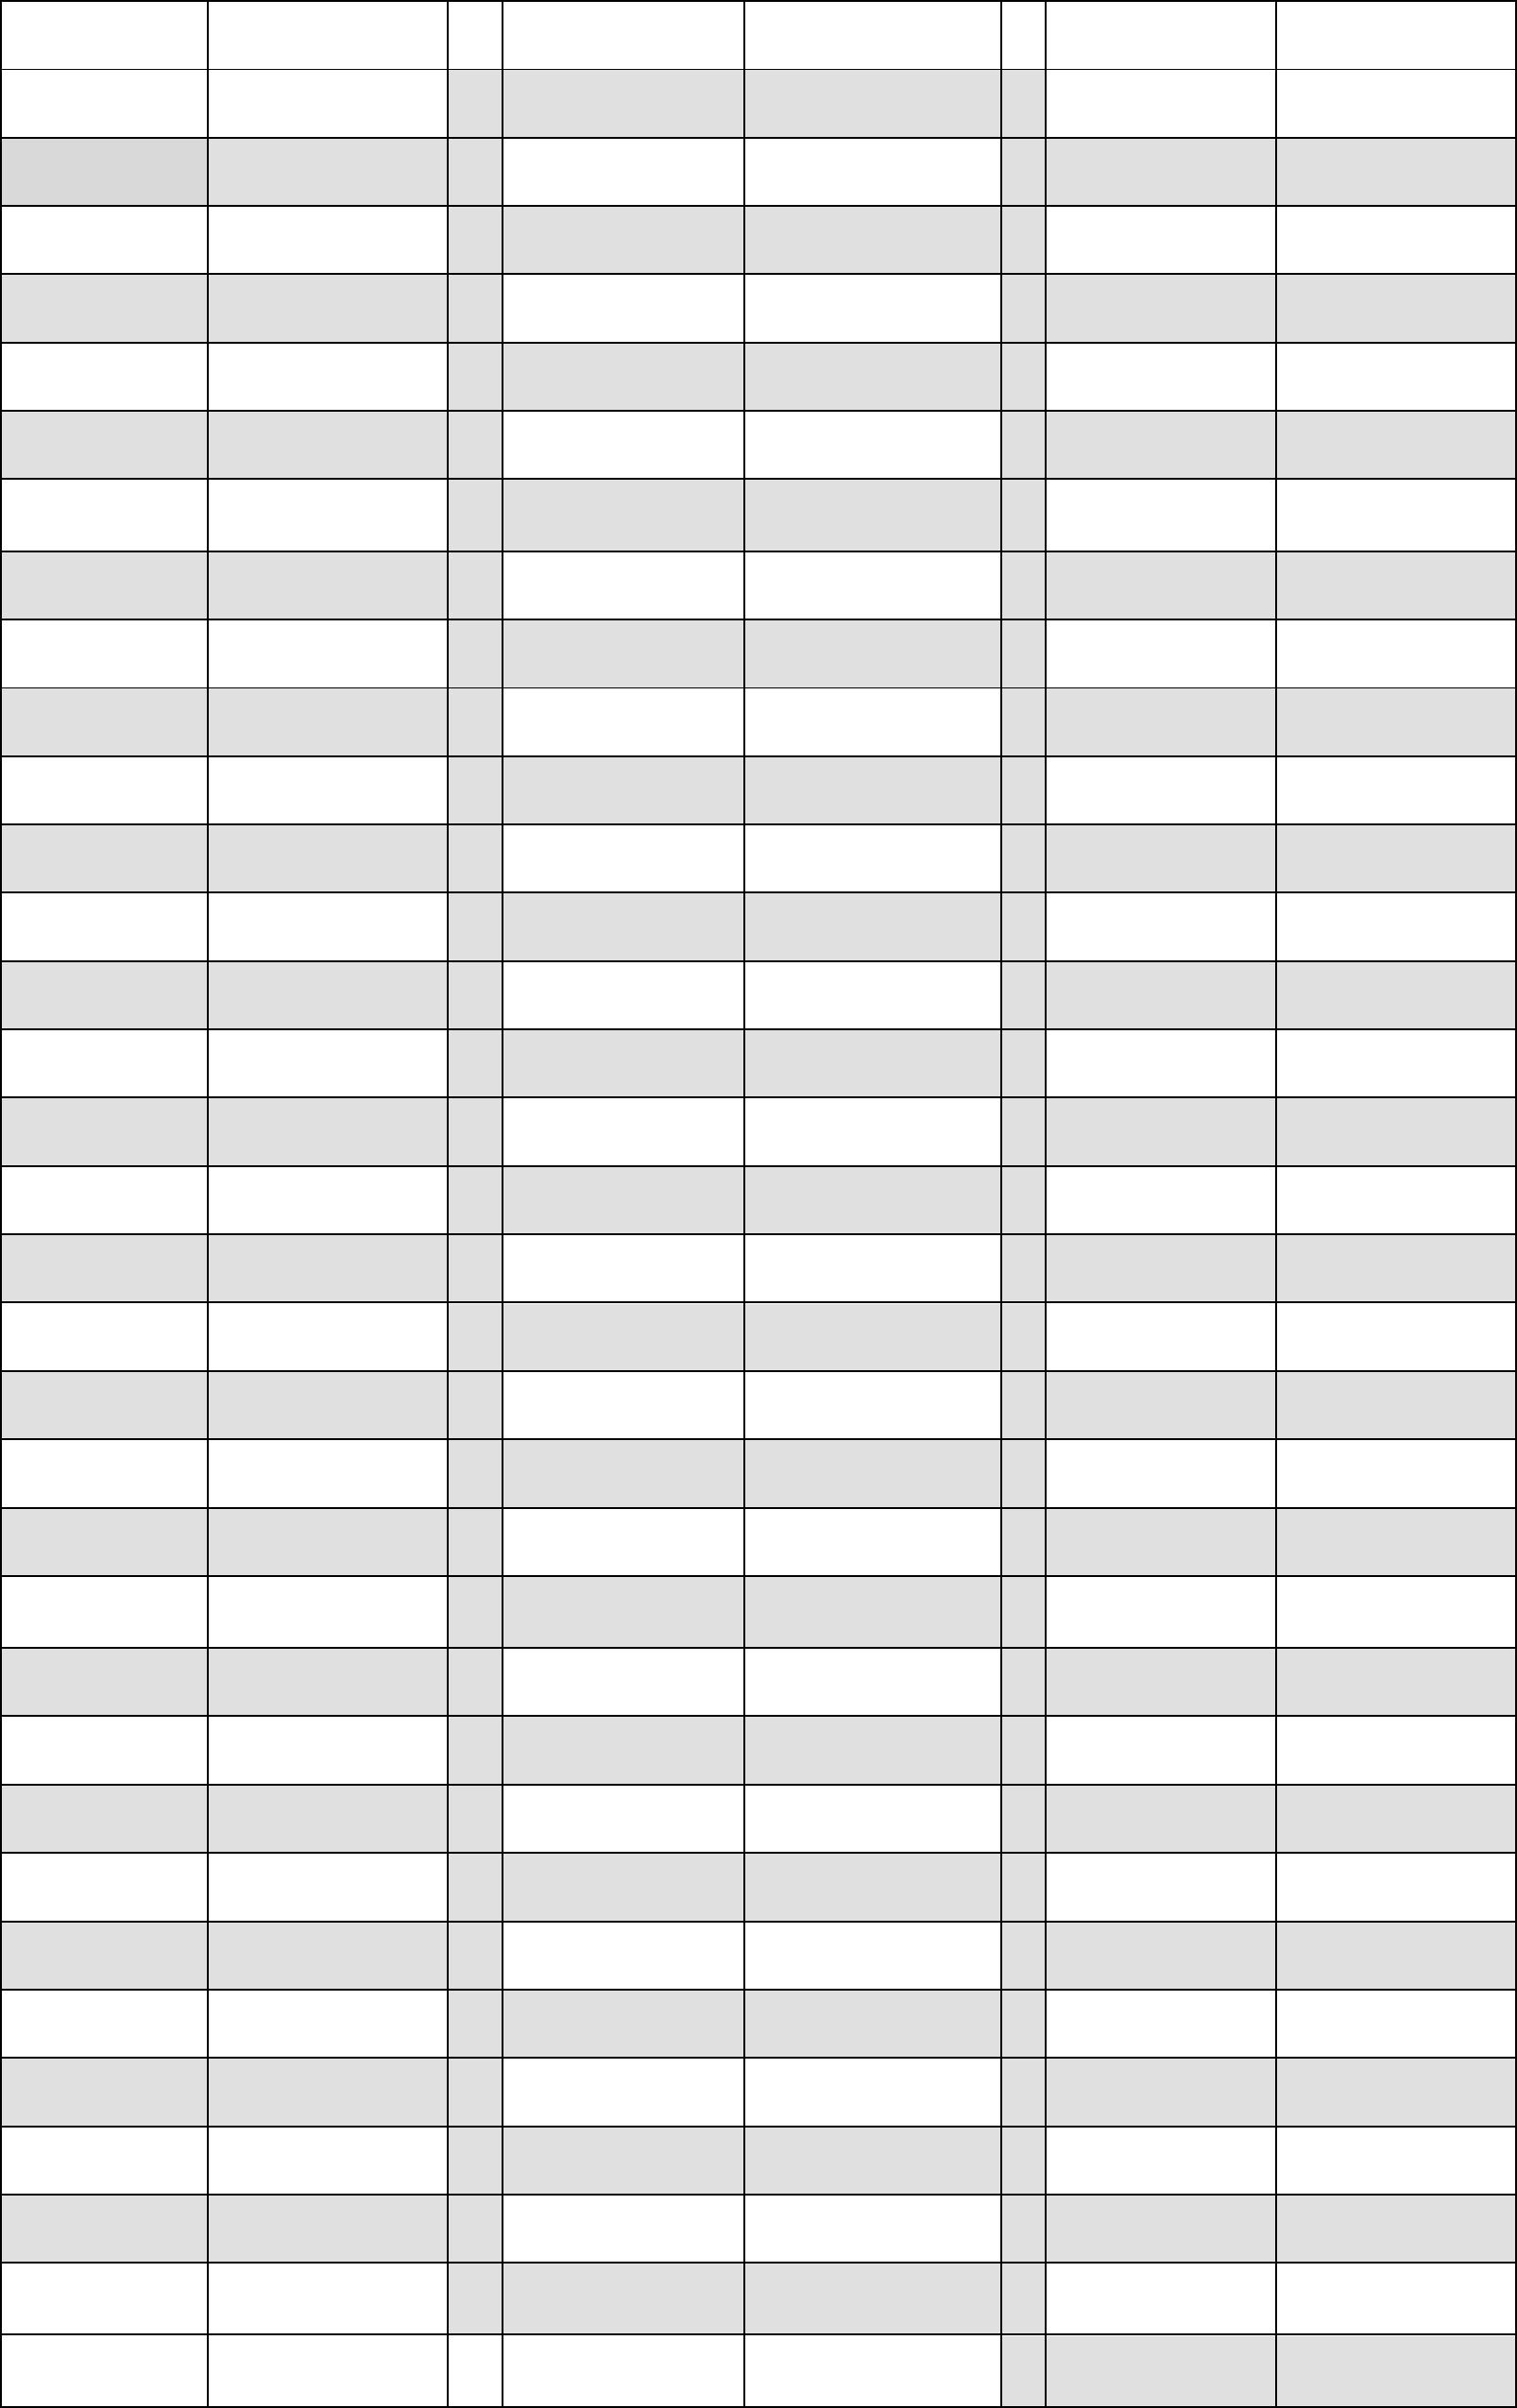 Square Root Curve Chart Square Root Curve Chart Free Download